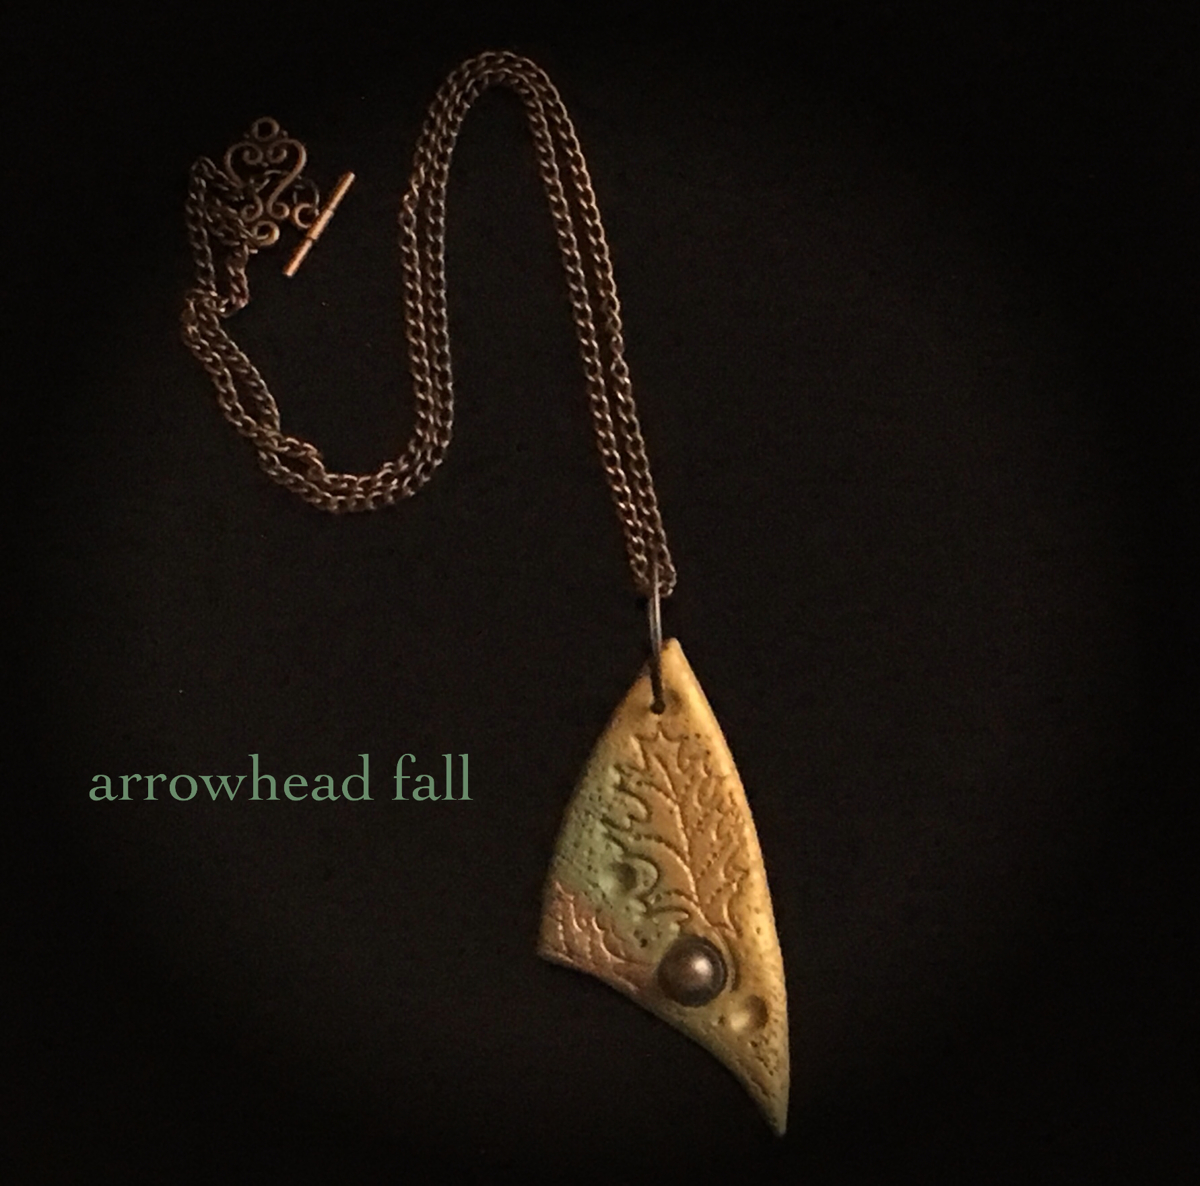 Arrowhead Fall (large view)